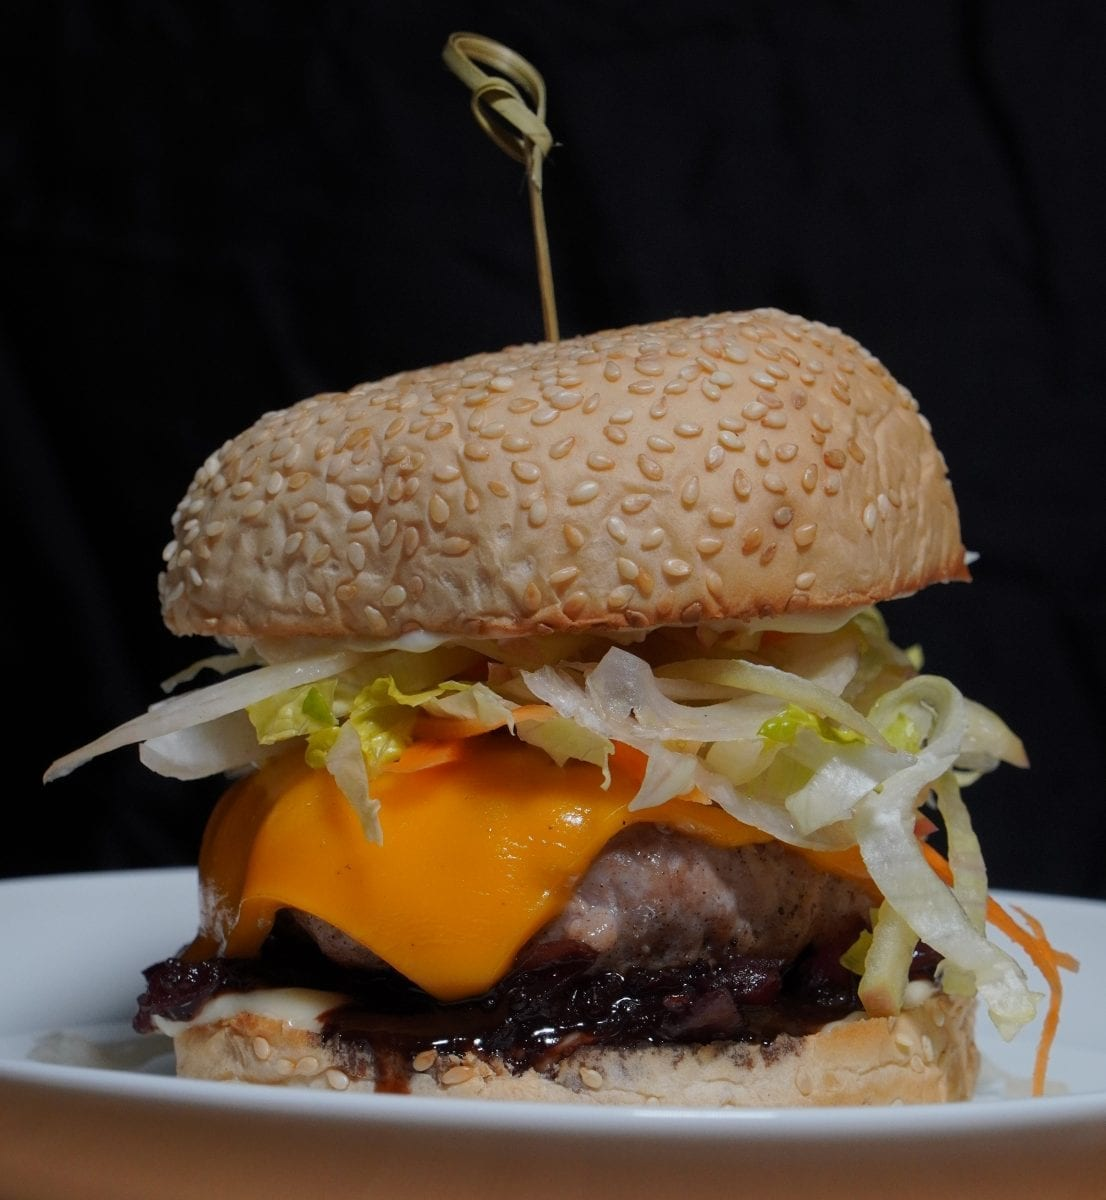 fennel and apple slaw pork burger recipe